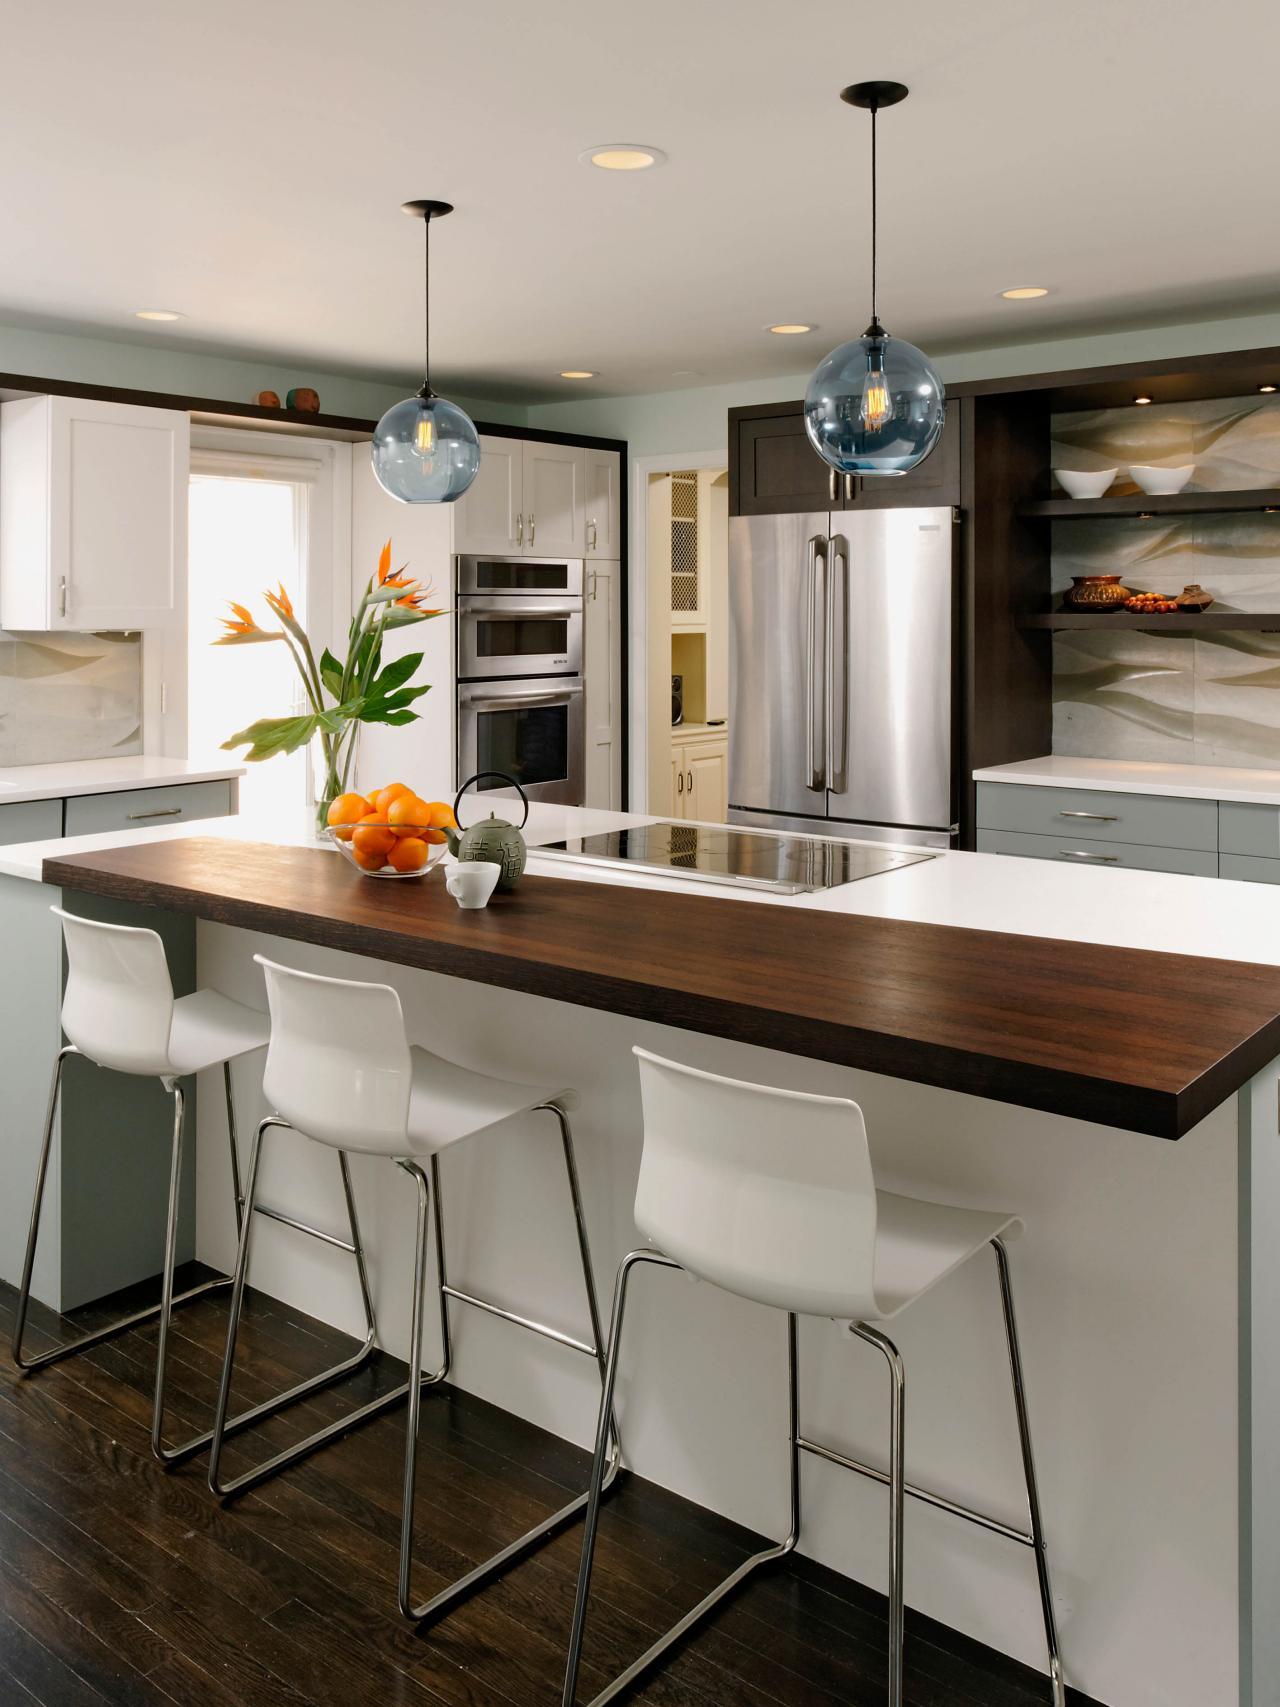 Uncategorized White Kitchen Countertops white kitchen countertops pictures ideas from hgtv tags